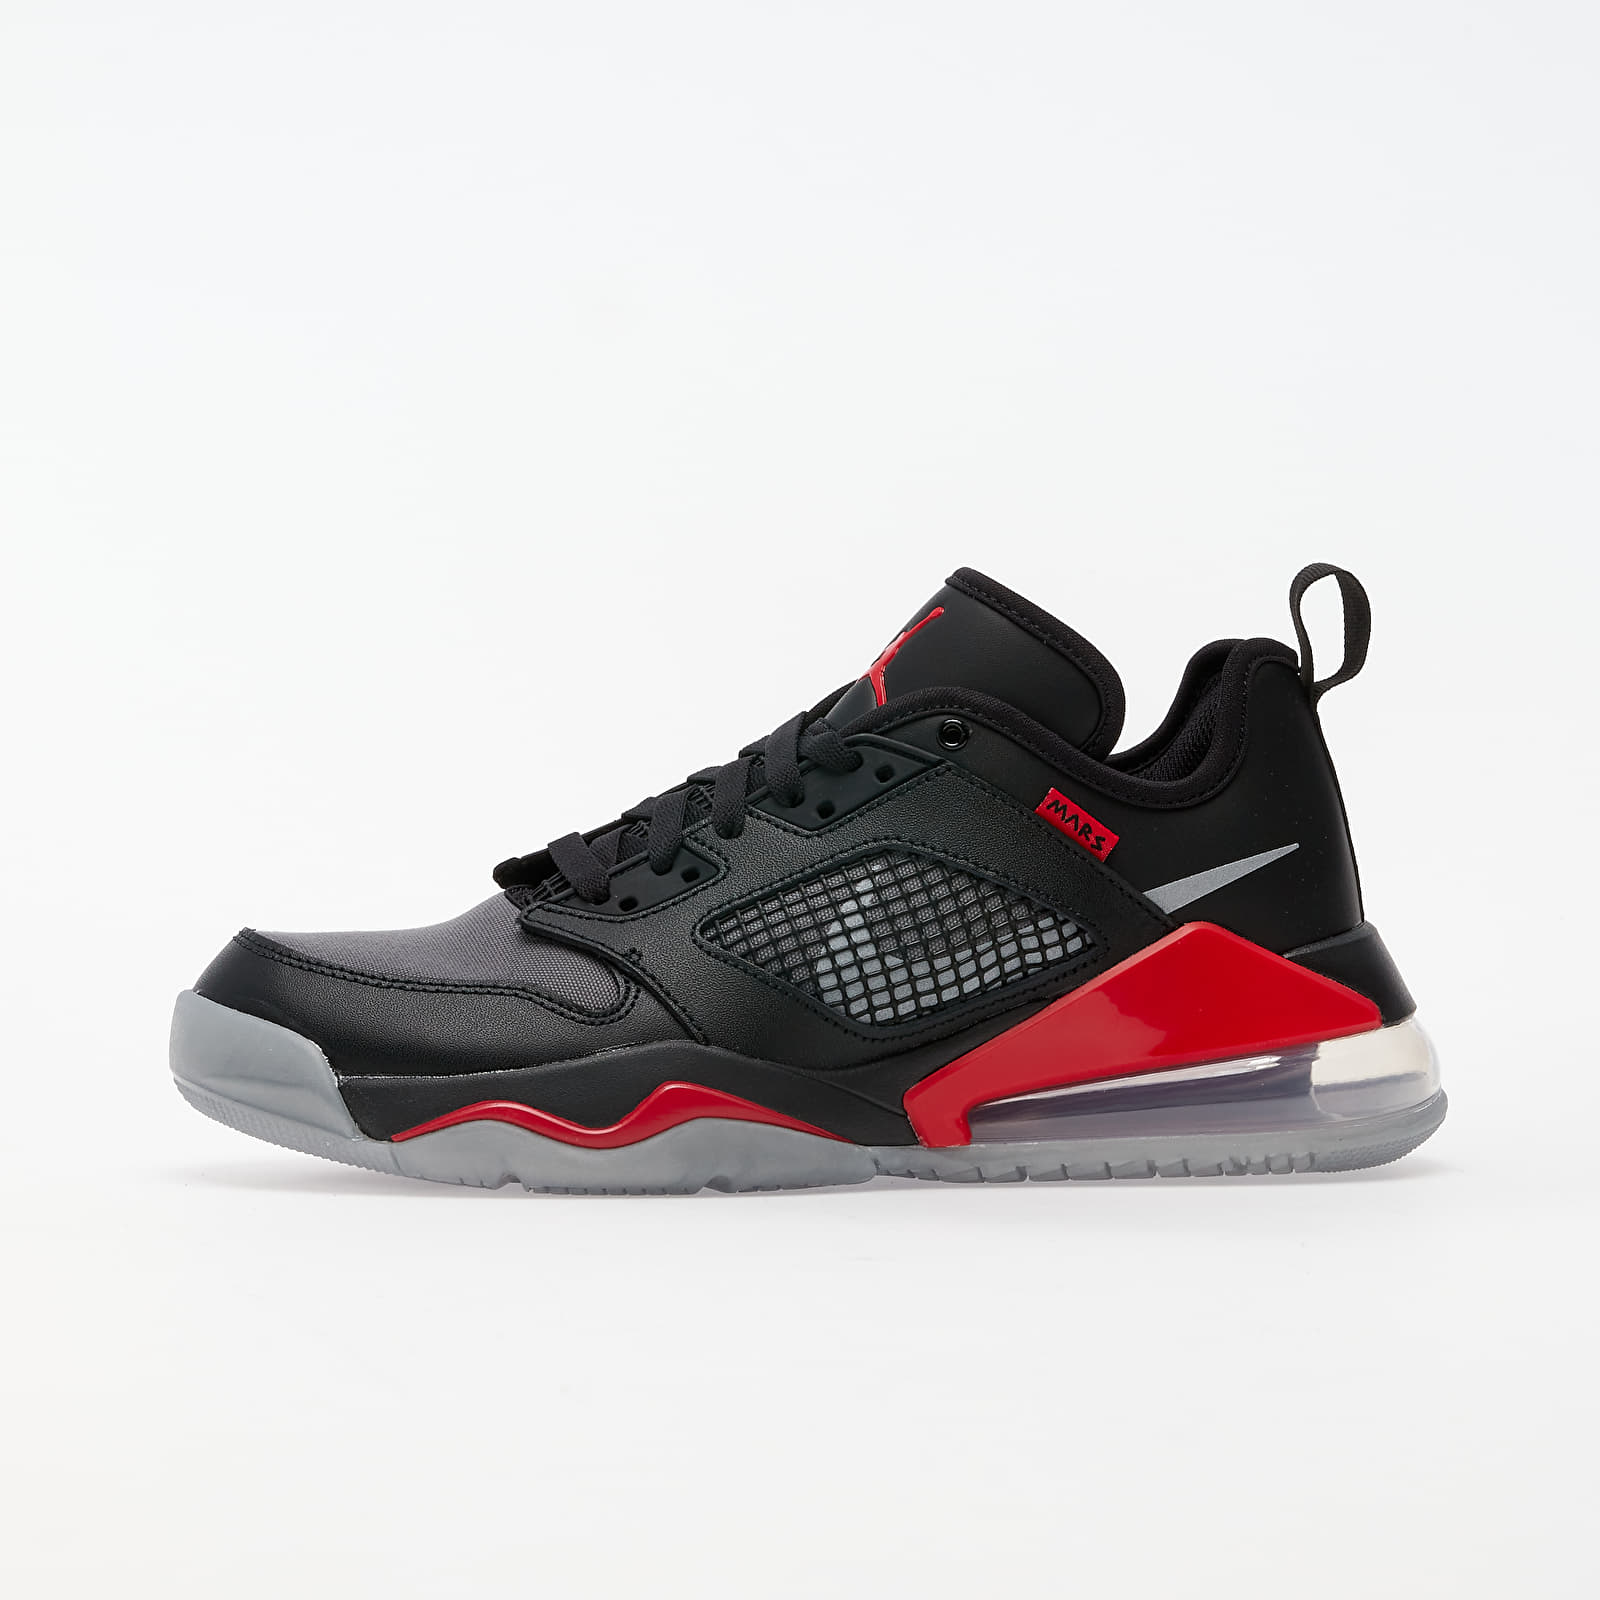 Pánské tenisky a boty Jordan Mars 270 Low Black/ Metallic Silver-University Red